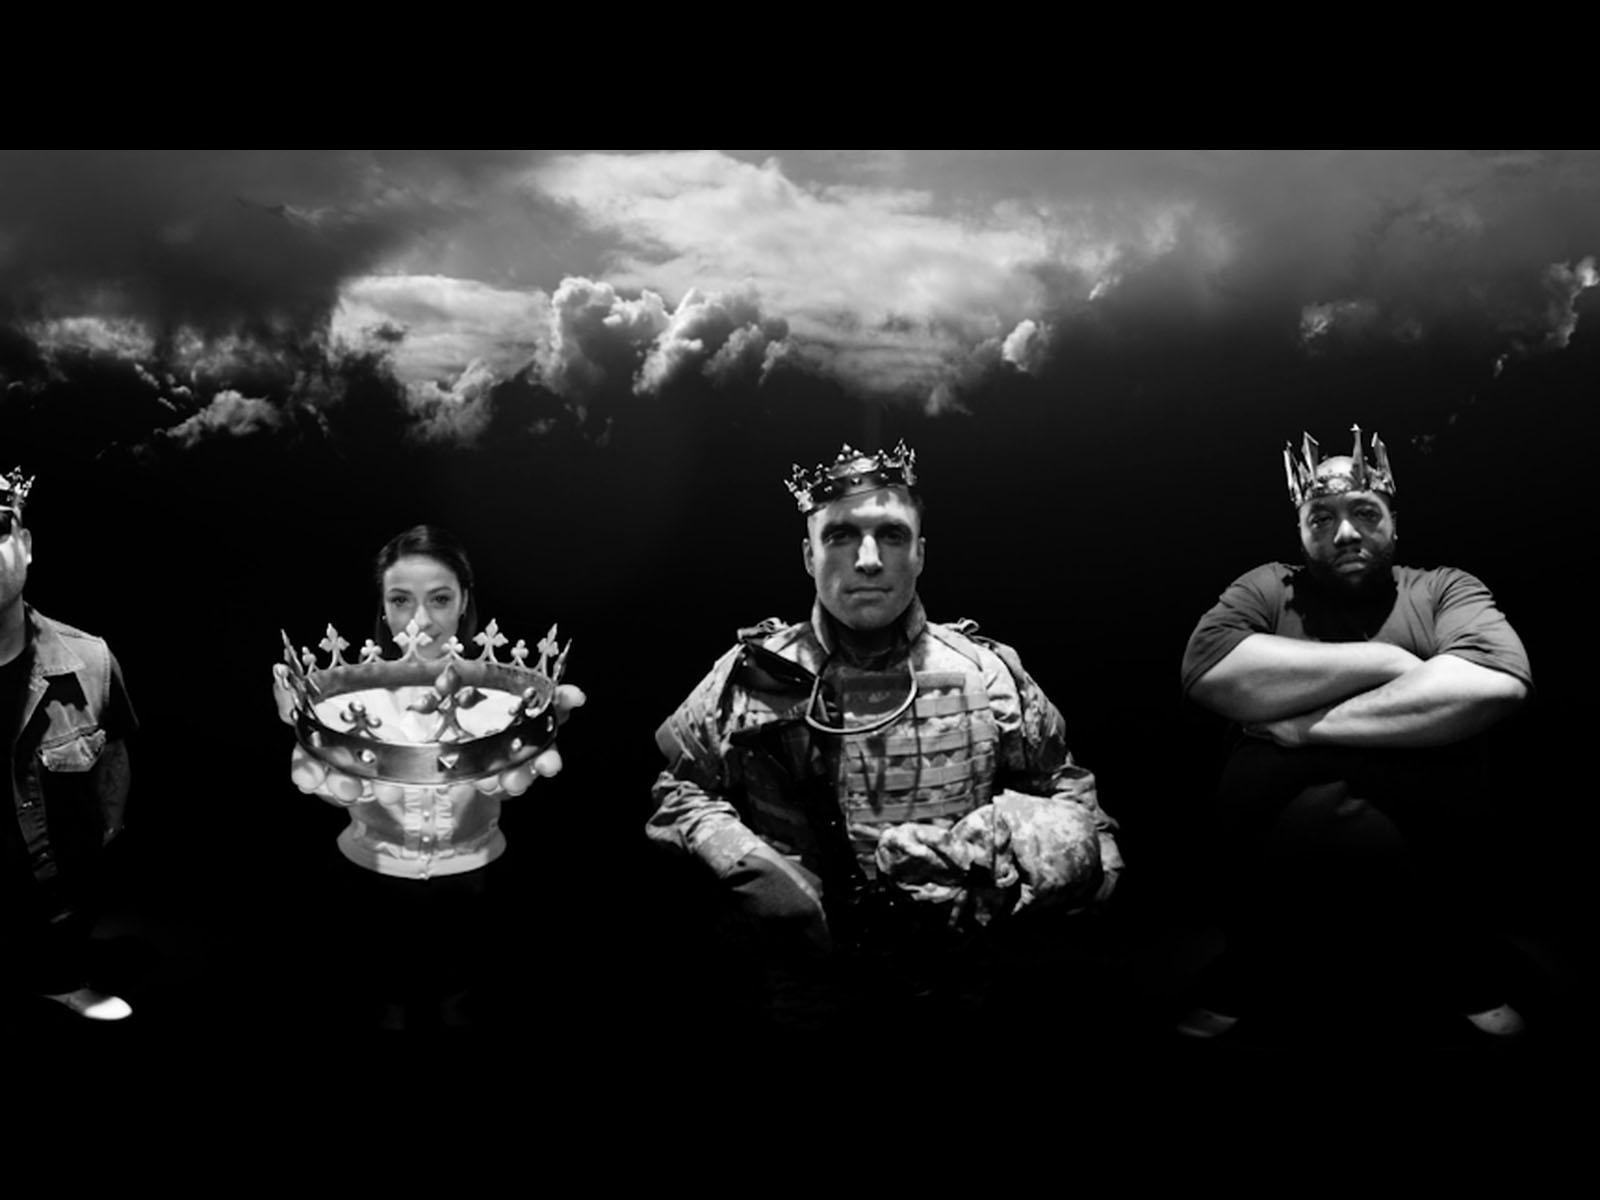 360° VR MUSIC VIDEO